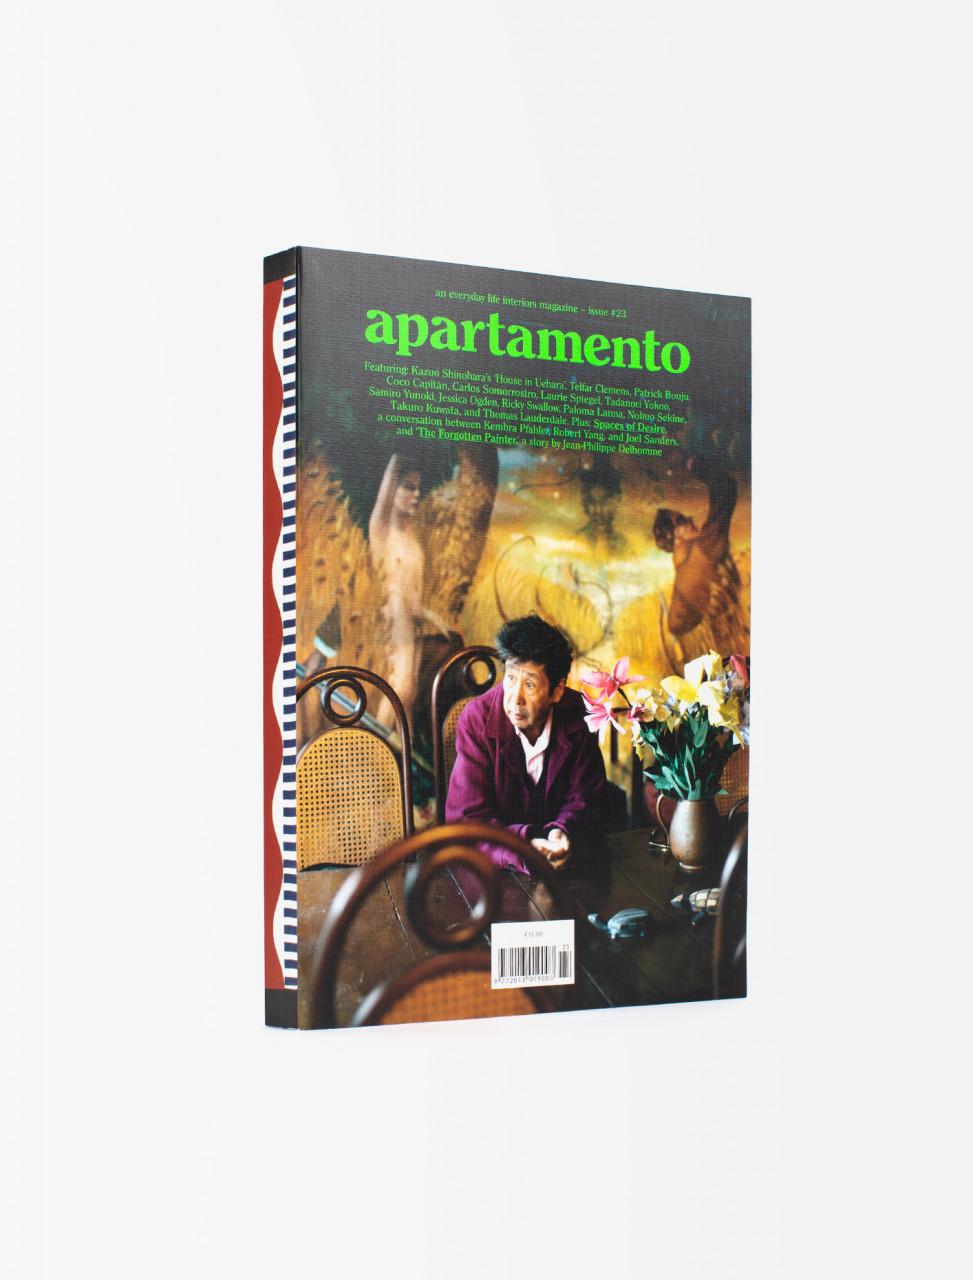 Apartamento - Issue #23